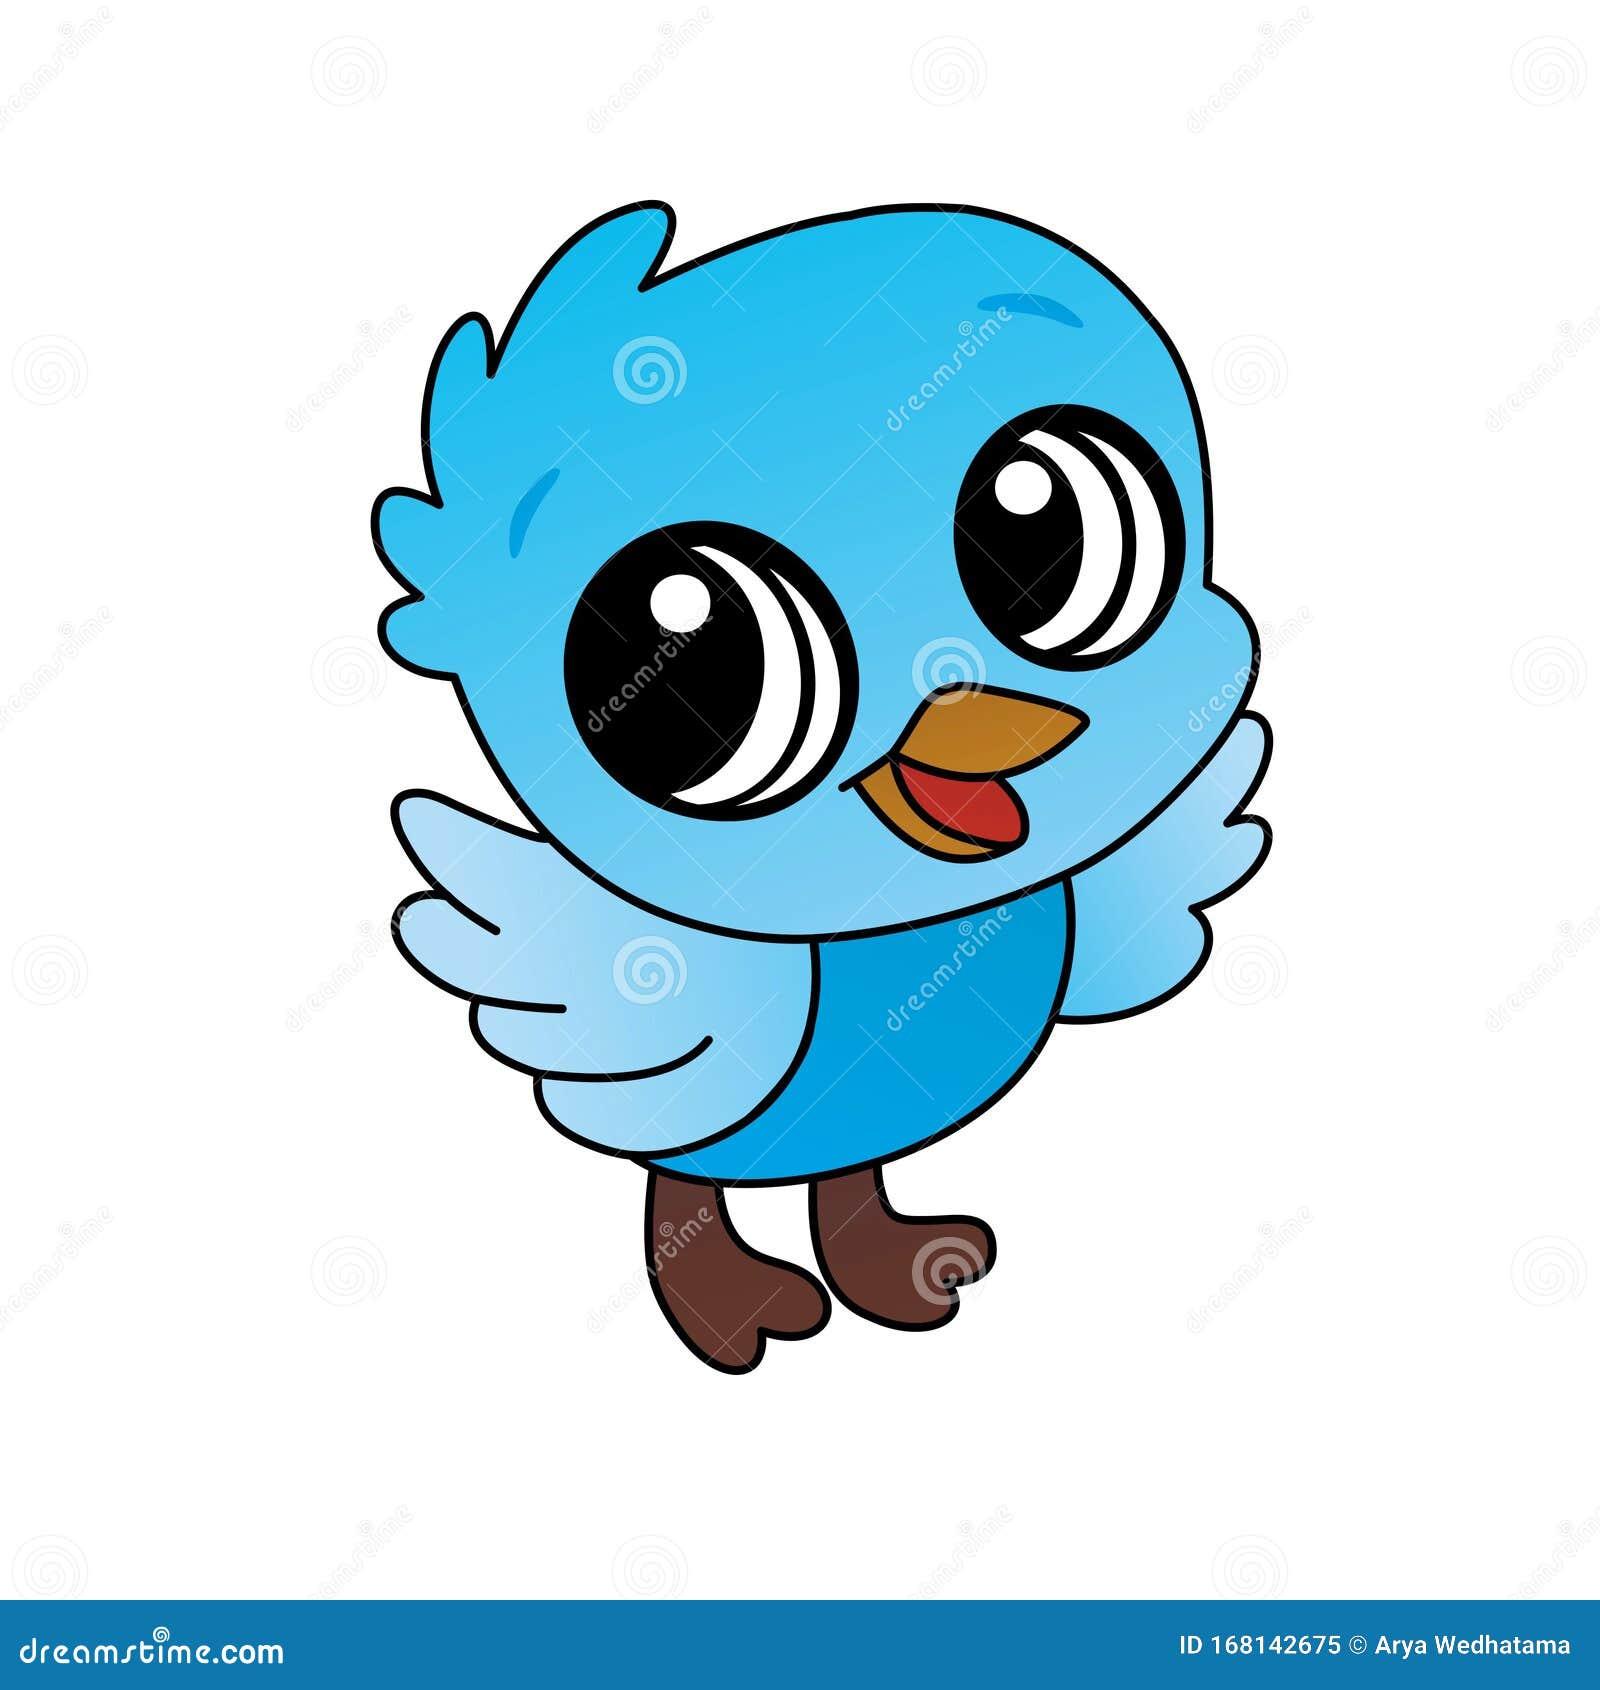 Illustration Of Blue Baby Bird Cartoon Cute Funny Character Flat Design Stock Image Illustration Of Cartoon Collection 168142675